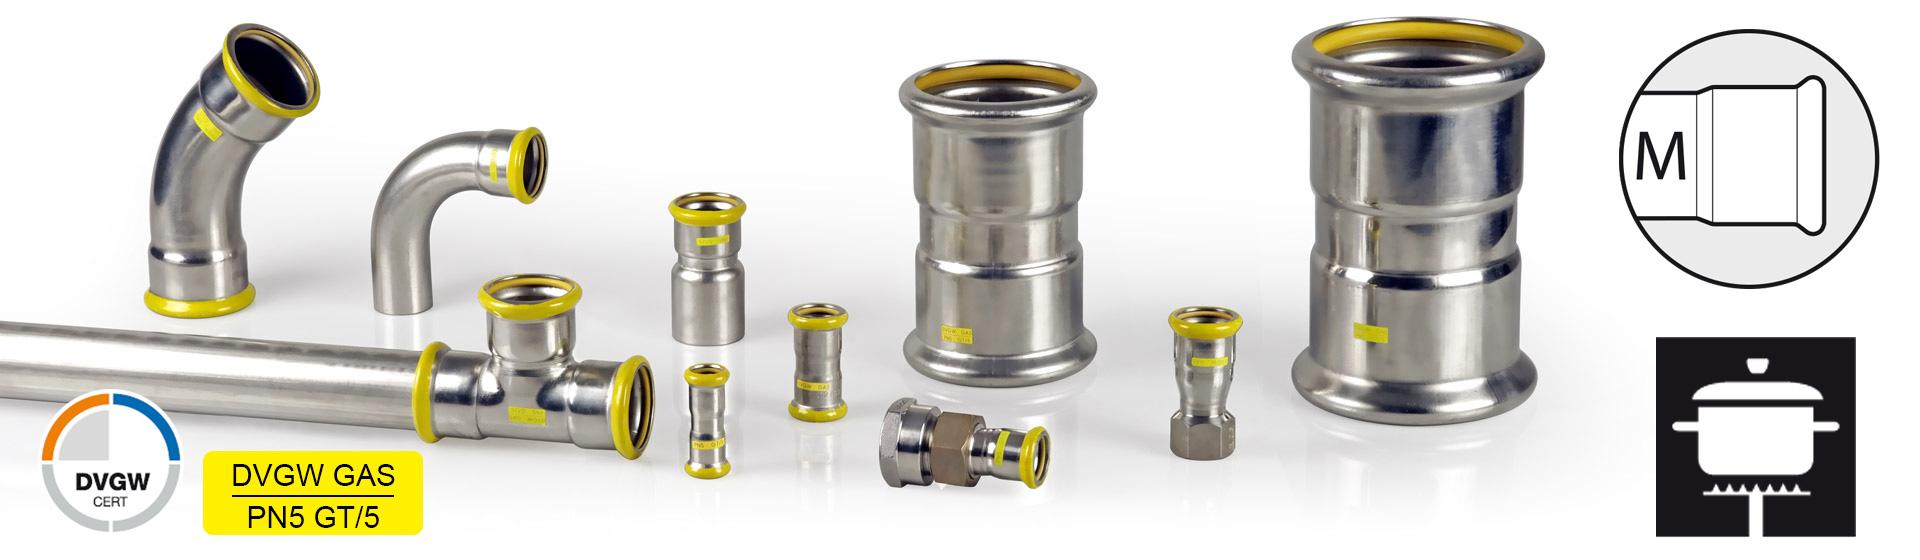 Eurotubi Pressfitting System - Acciaio Inox AISI 3016L GAS